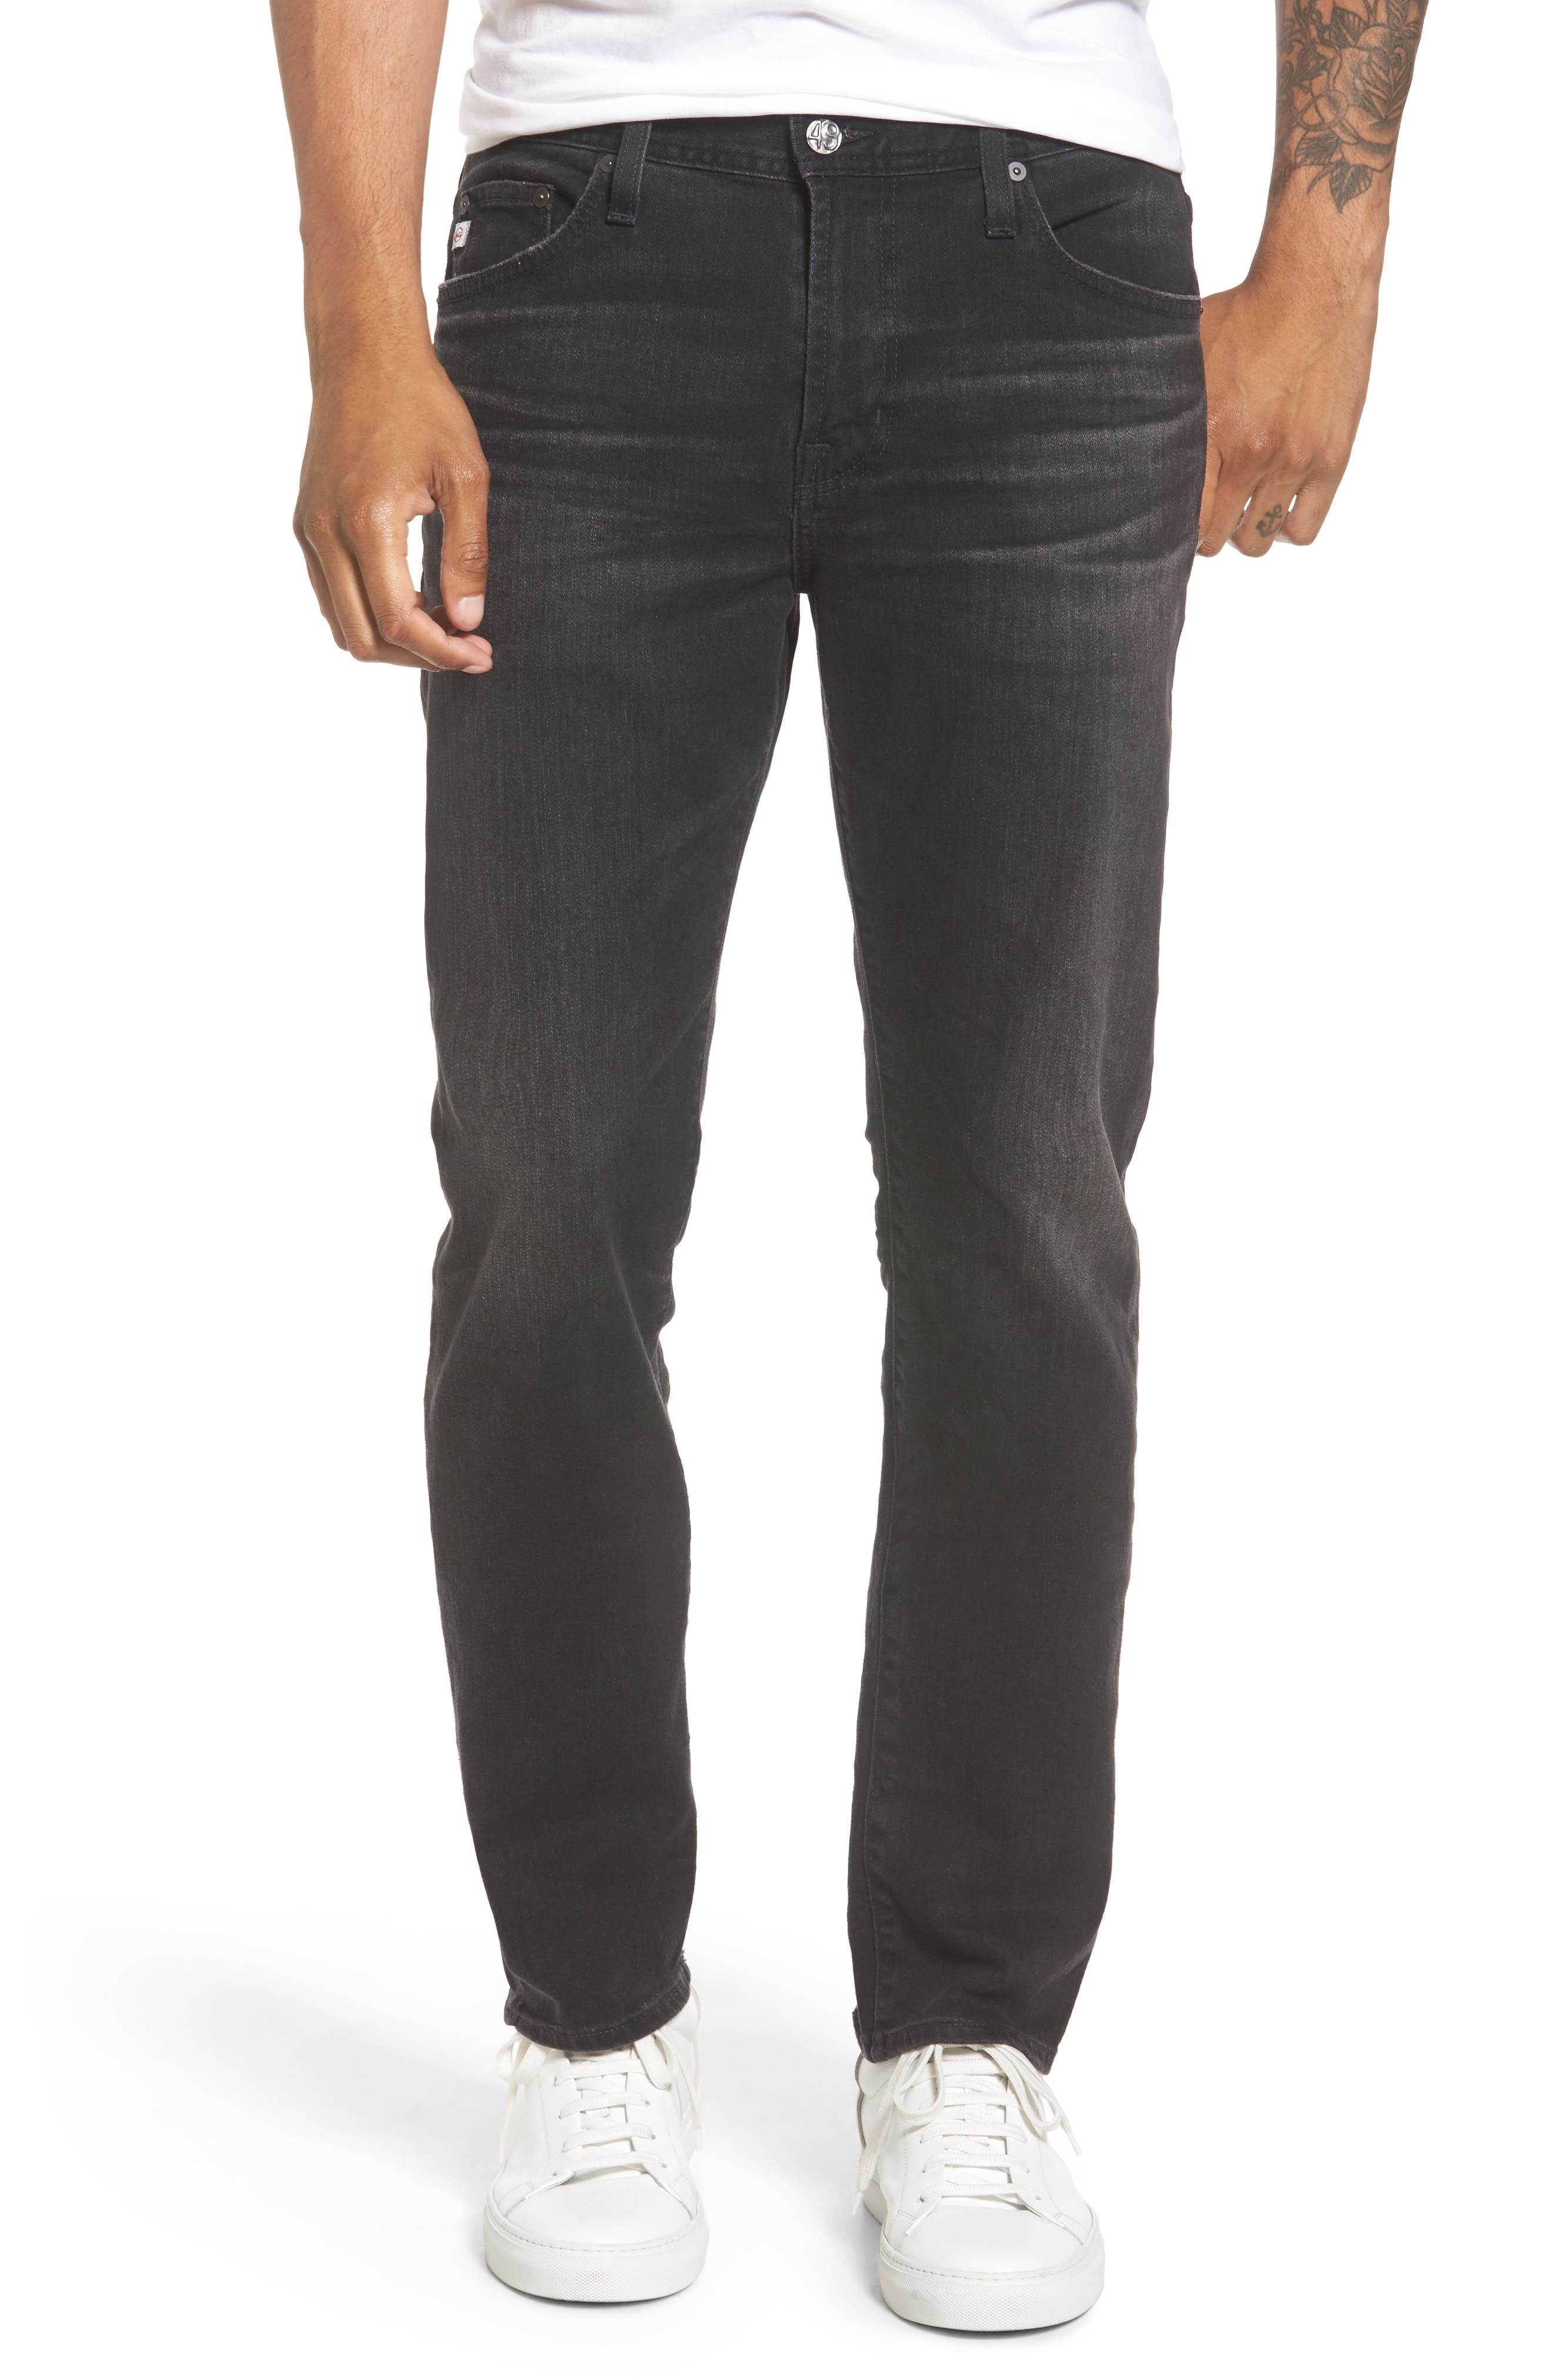 Everett Slim Straight Leg Jeans,                             Main thumbnail 1, color,                             4 Years Down